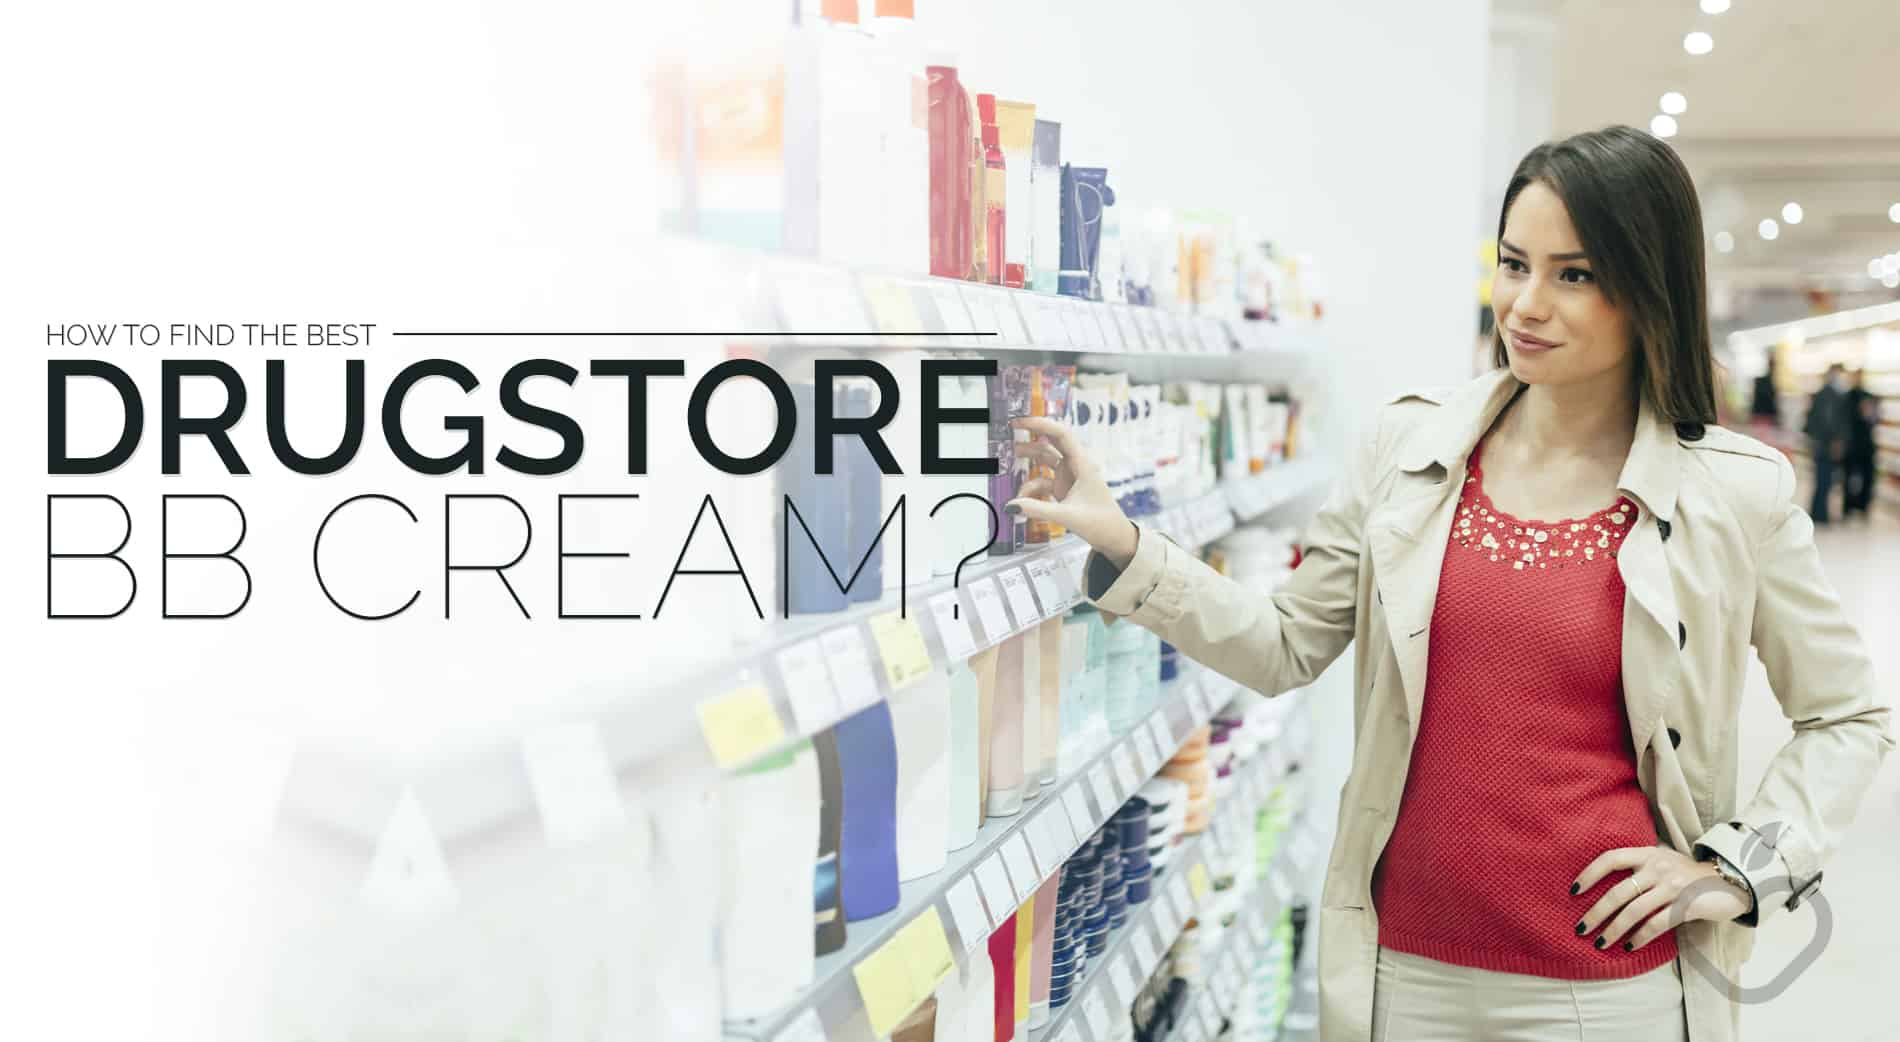 Drugstore BB Cream Image Design 1 - How To Discover The Greatest Drugstore BB Cream